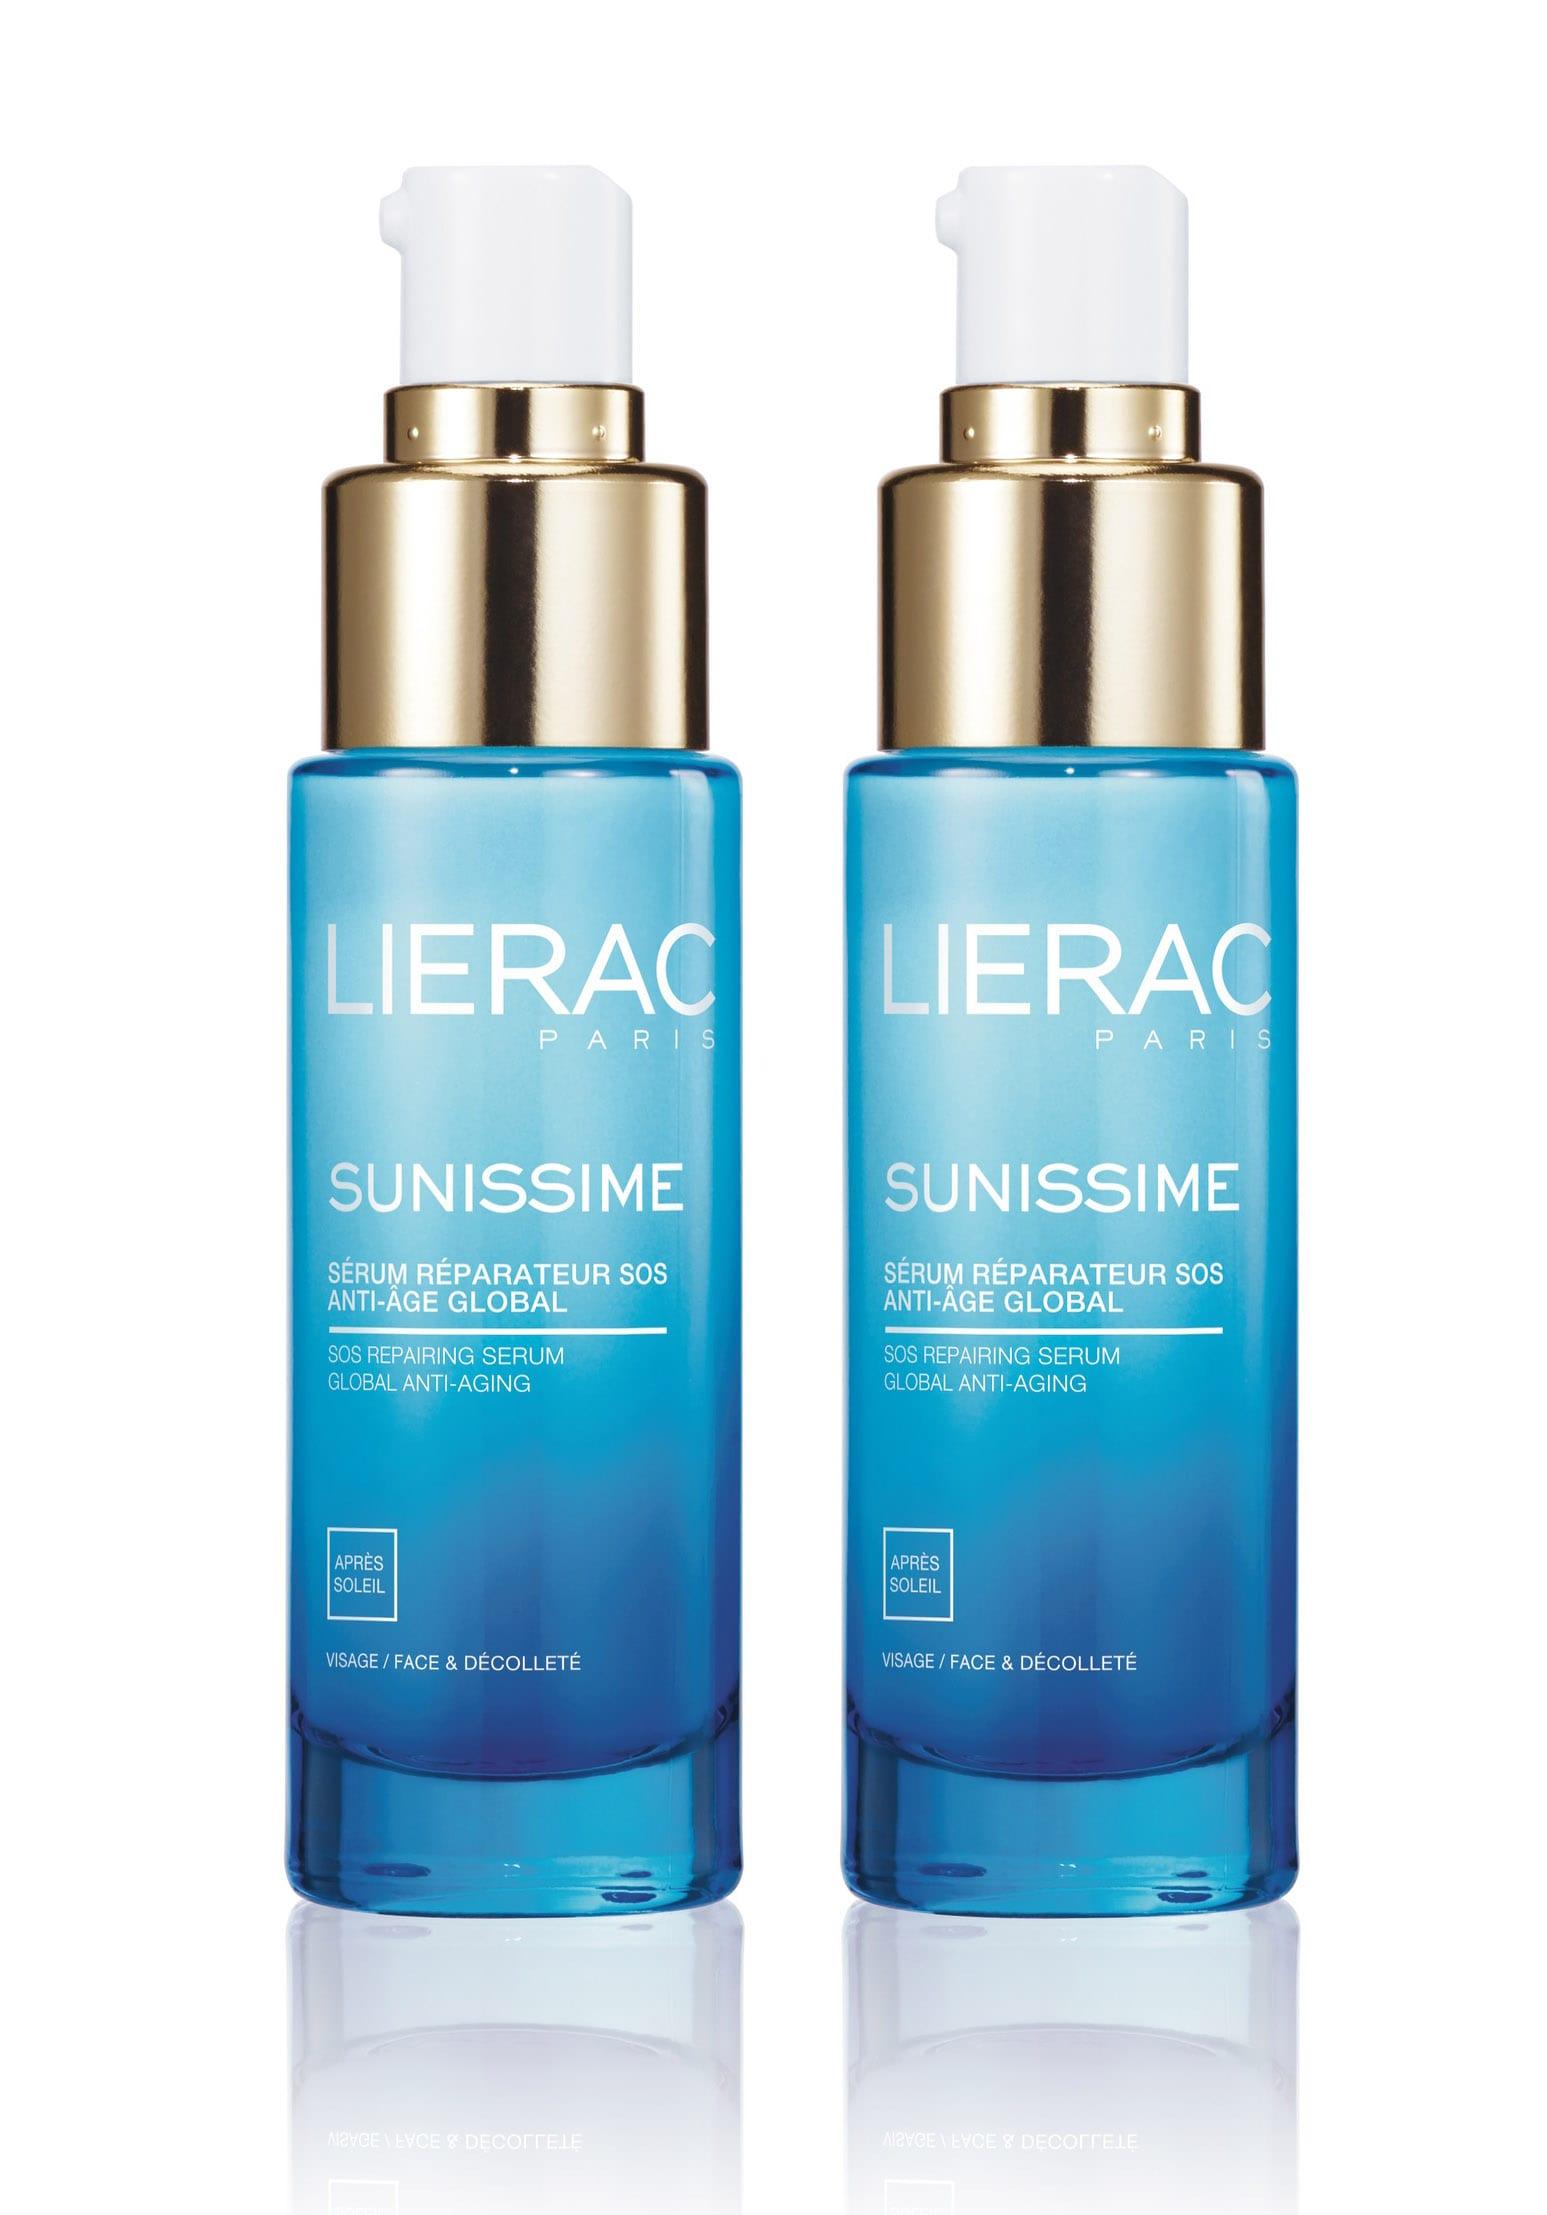 2 x Lierac Sunissime Serum Reparateur SOS Anti-Age Global Ορός Άμεσης Ανανέωσης & Ολικής Αντιγήρανσης για μετά τον ήλιο, για το πρόσωπο & το ντεκολτέ, 2 x 30ml